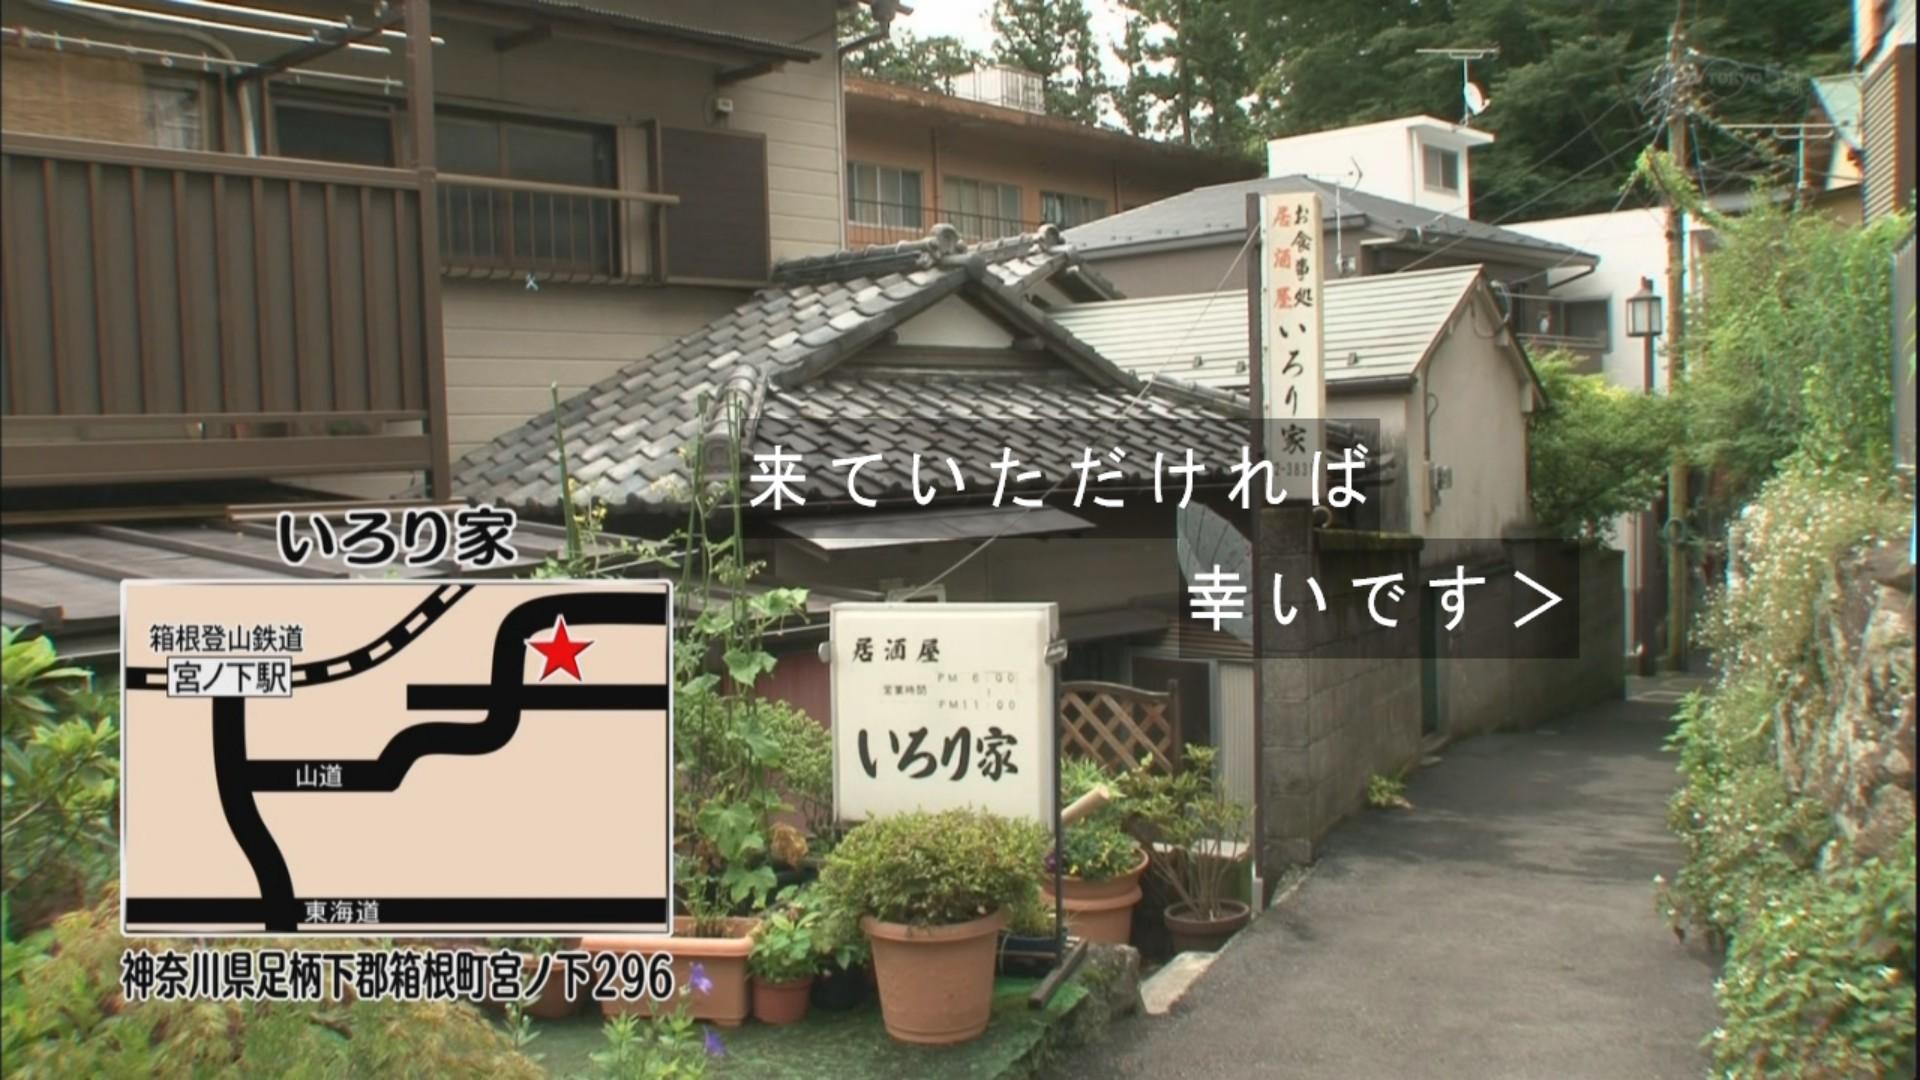 kodokunogurume03-035